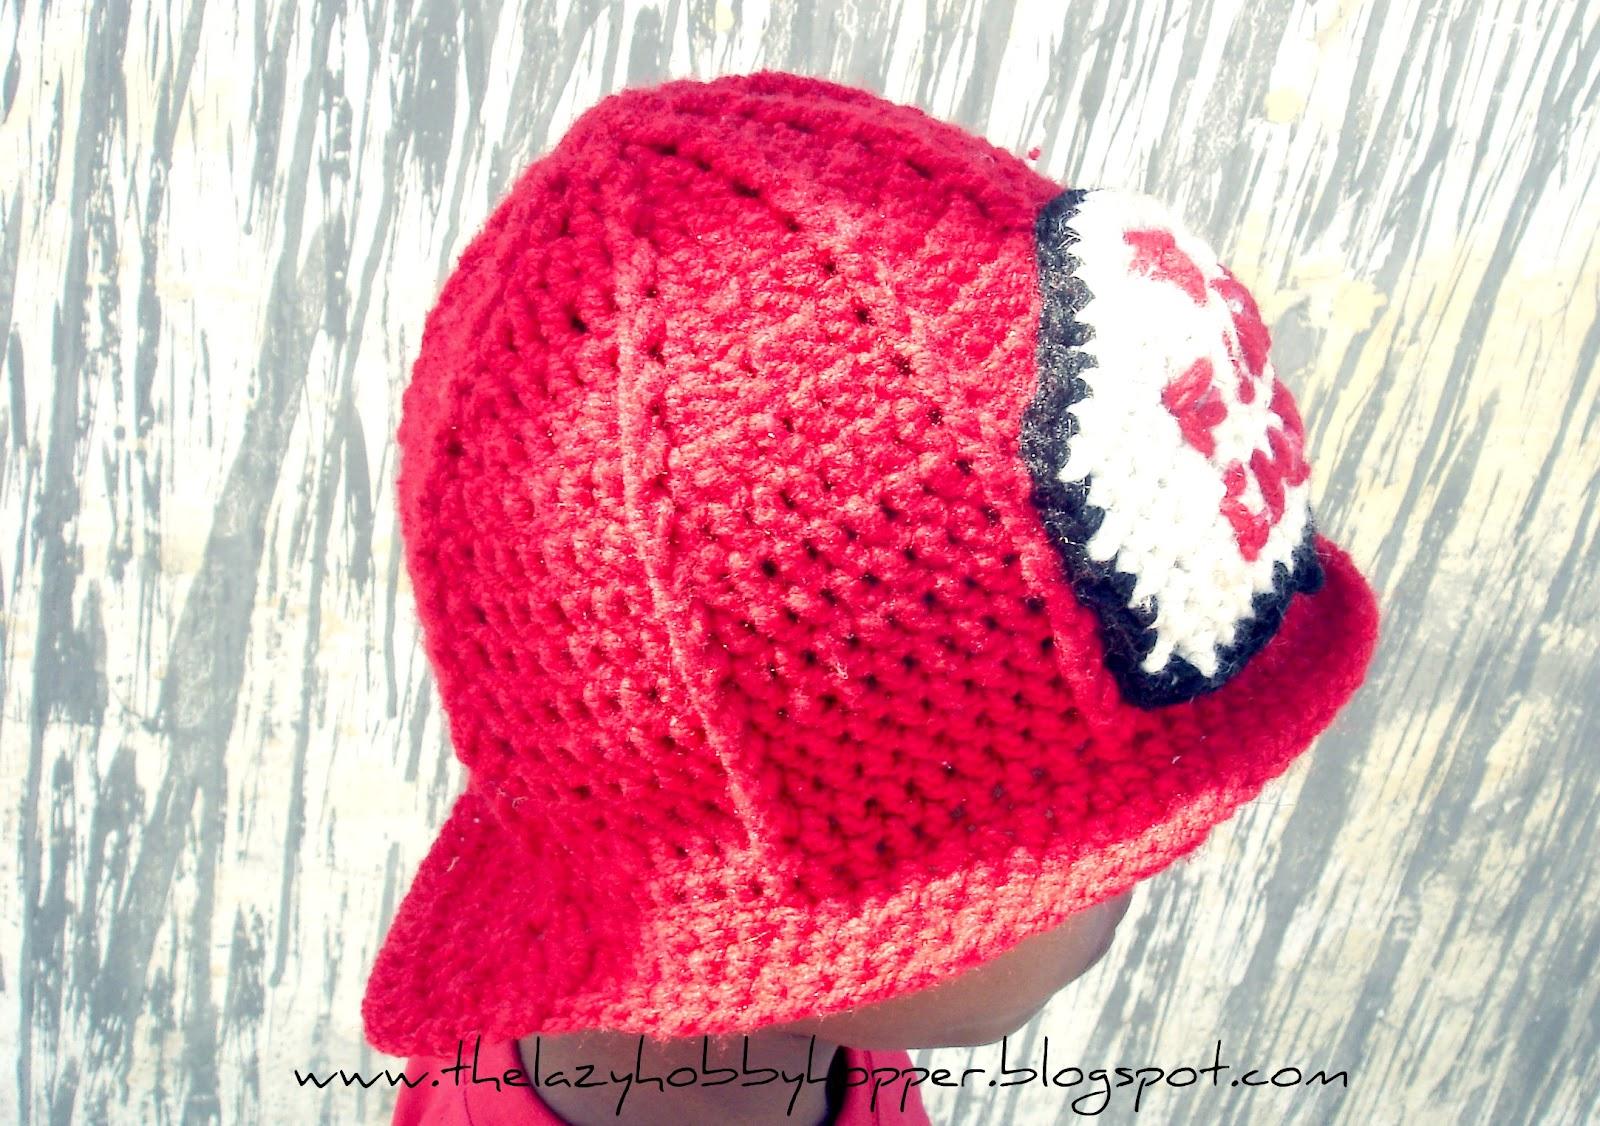 The Lazy Hobbyhopper: Crochet Fireman Hat